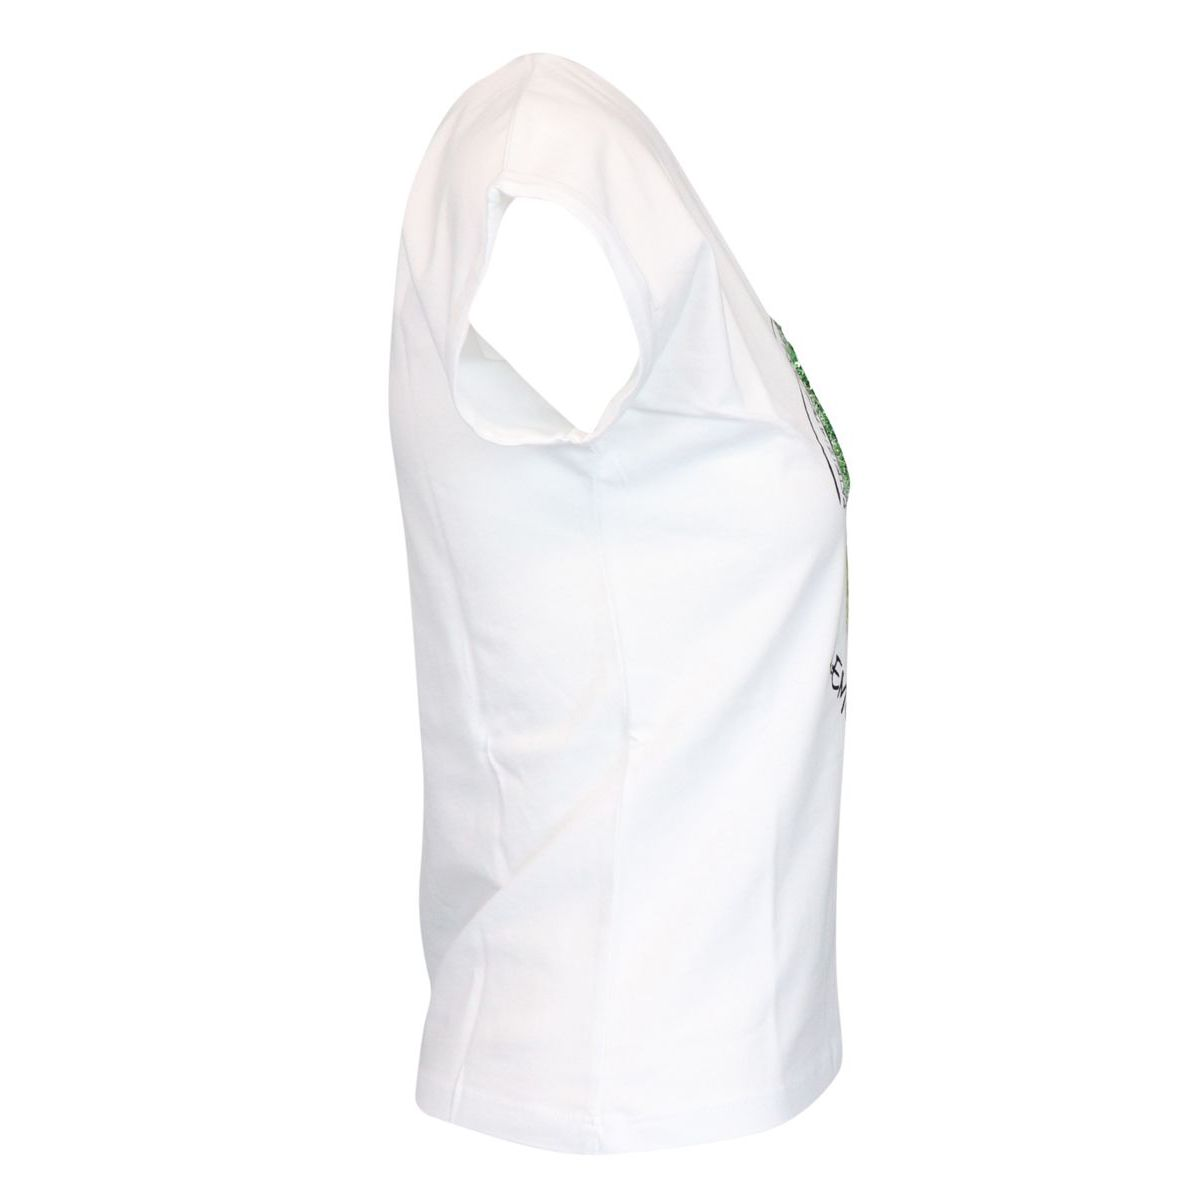 Lemon print cotton t-shirt with sequins White / yellow Patrizia Pepe